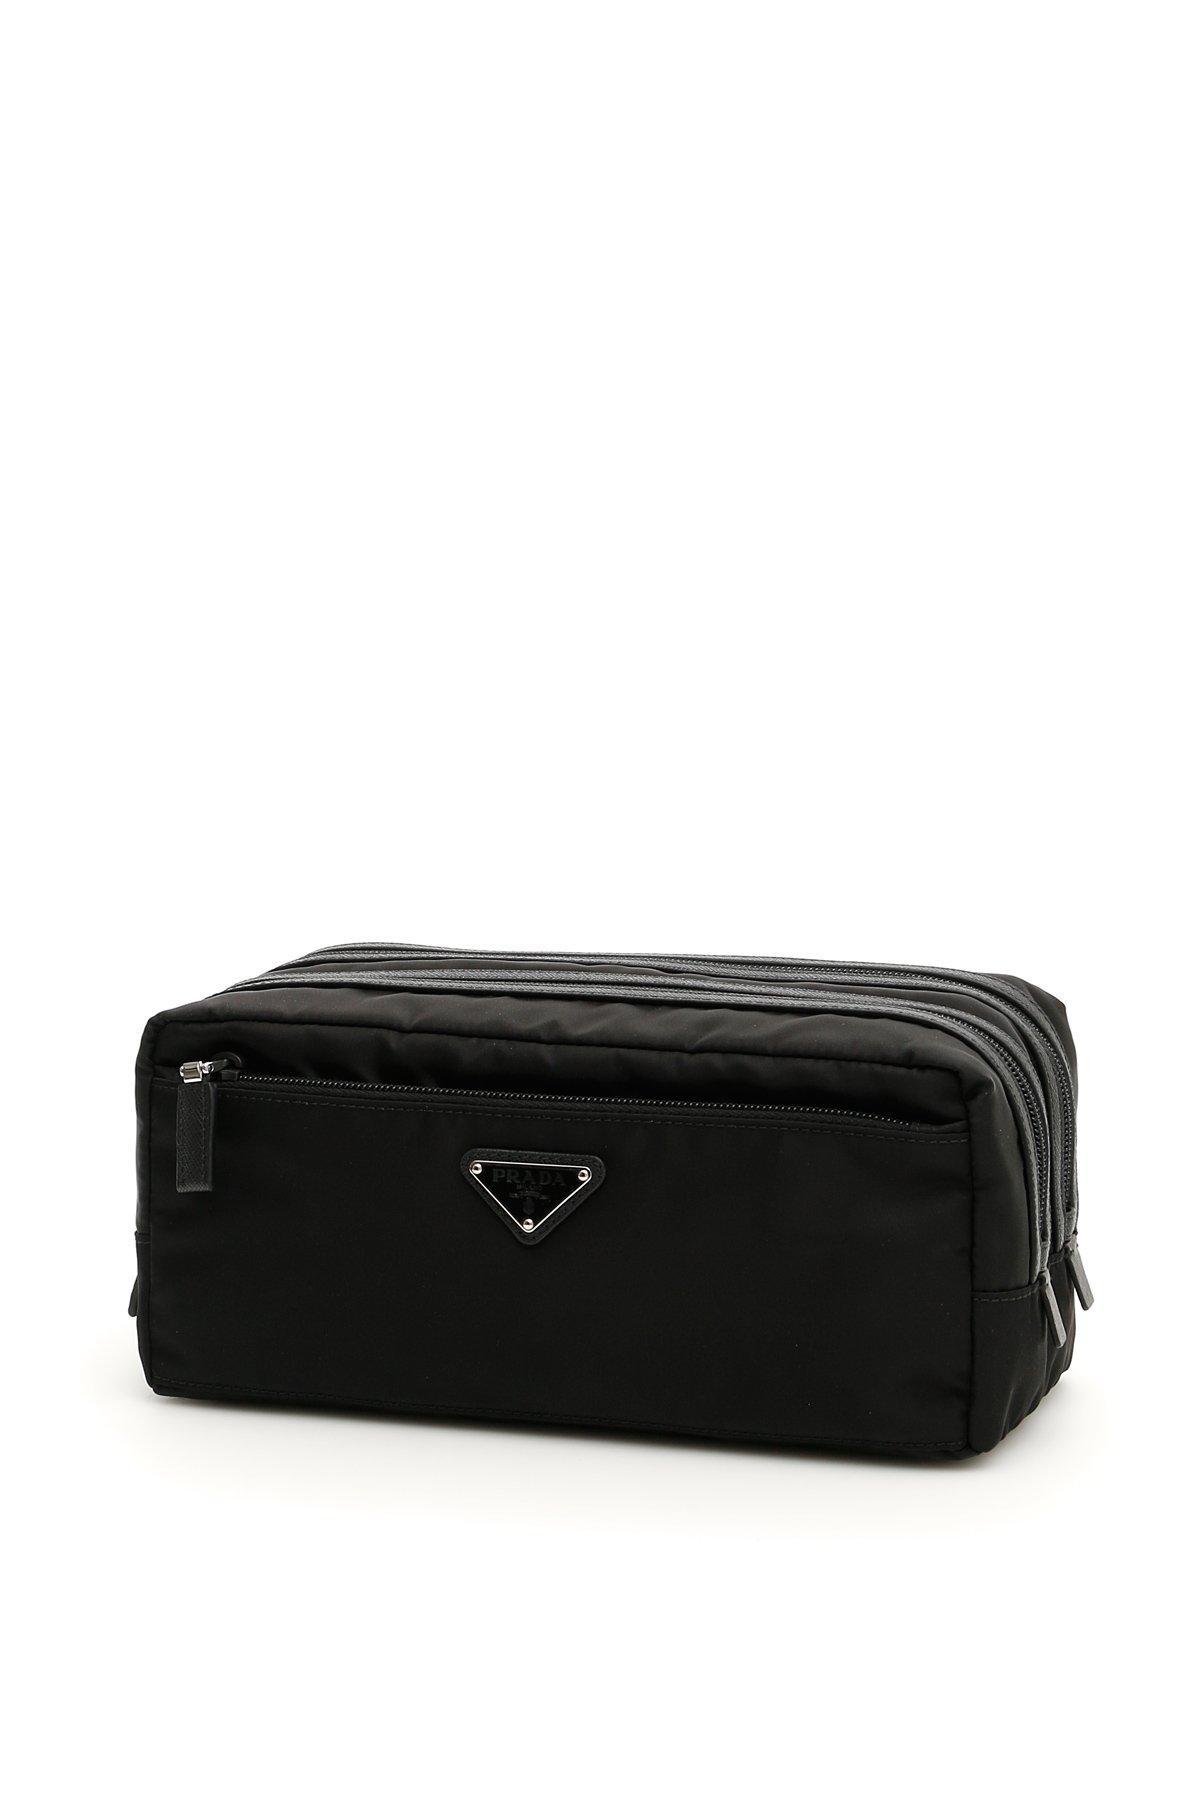 8a5a30db942f Prada Front Zip Toiletry Bag In Black   ModeSens